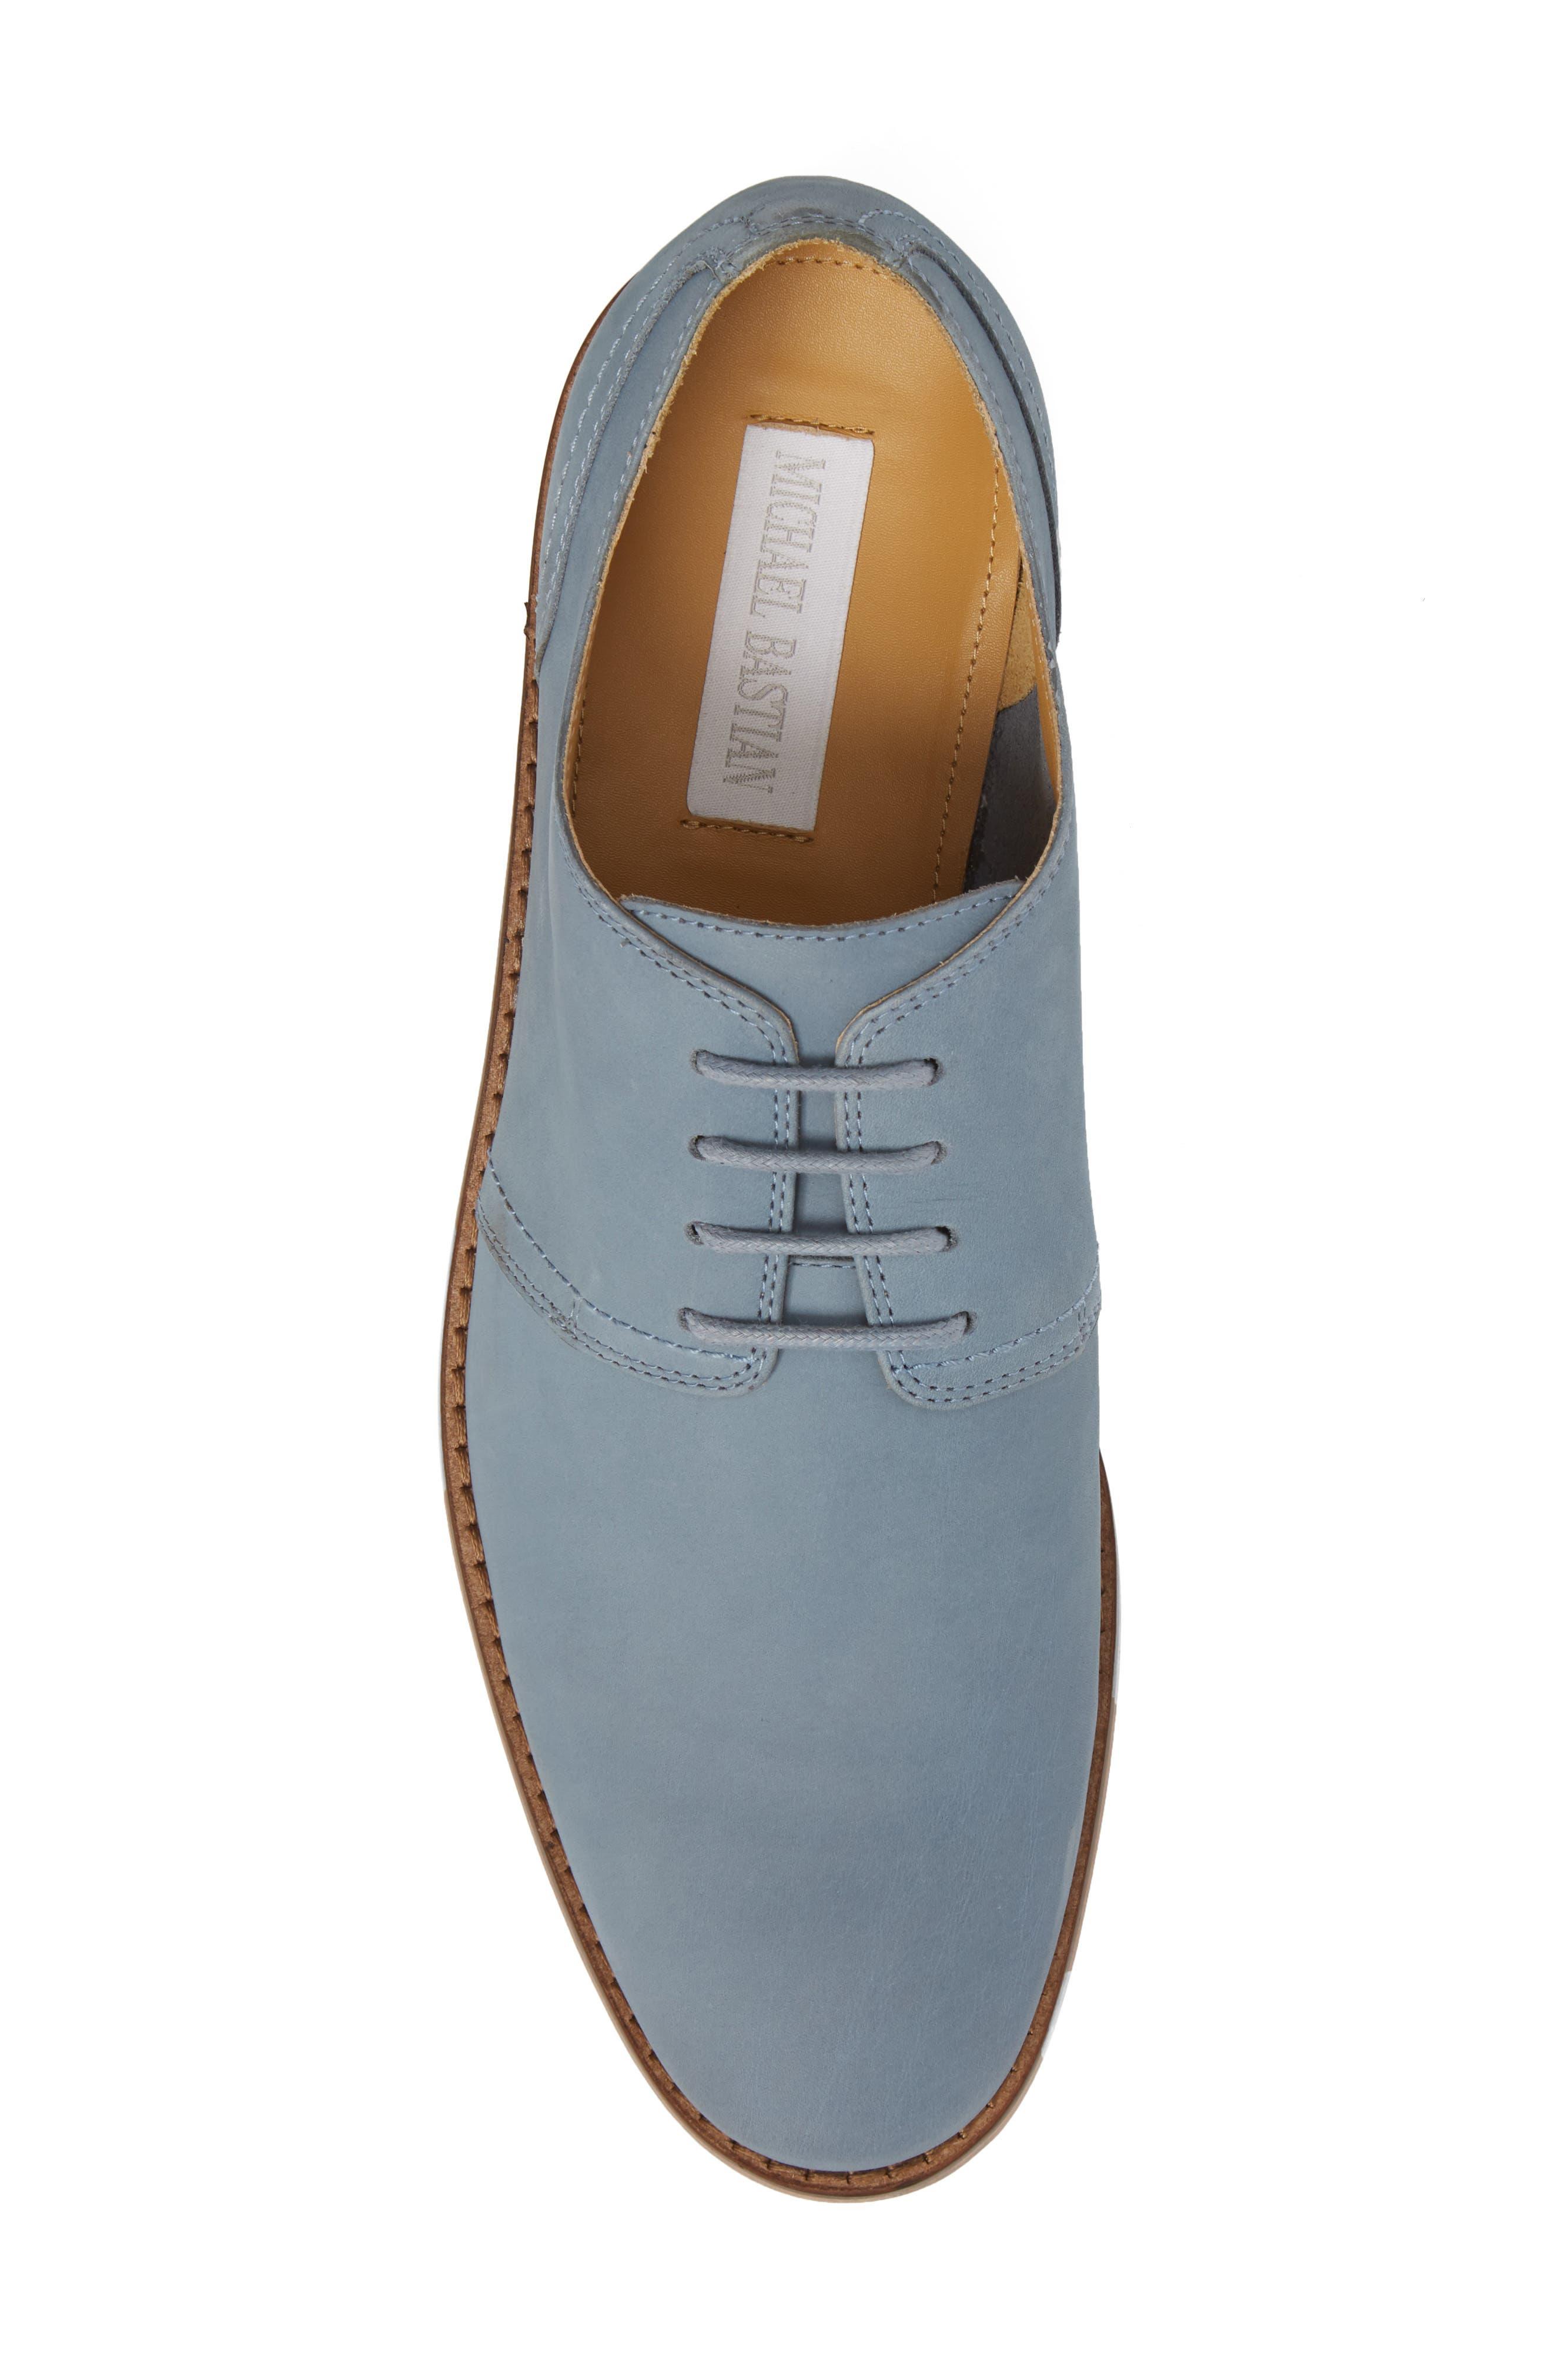 Caan Plain Toe Derby,                             Alternate thumbnail 5, color,                             Flint Stone Leather